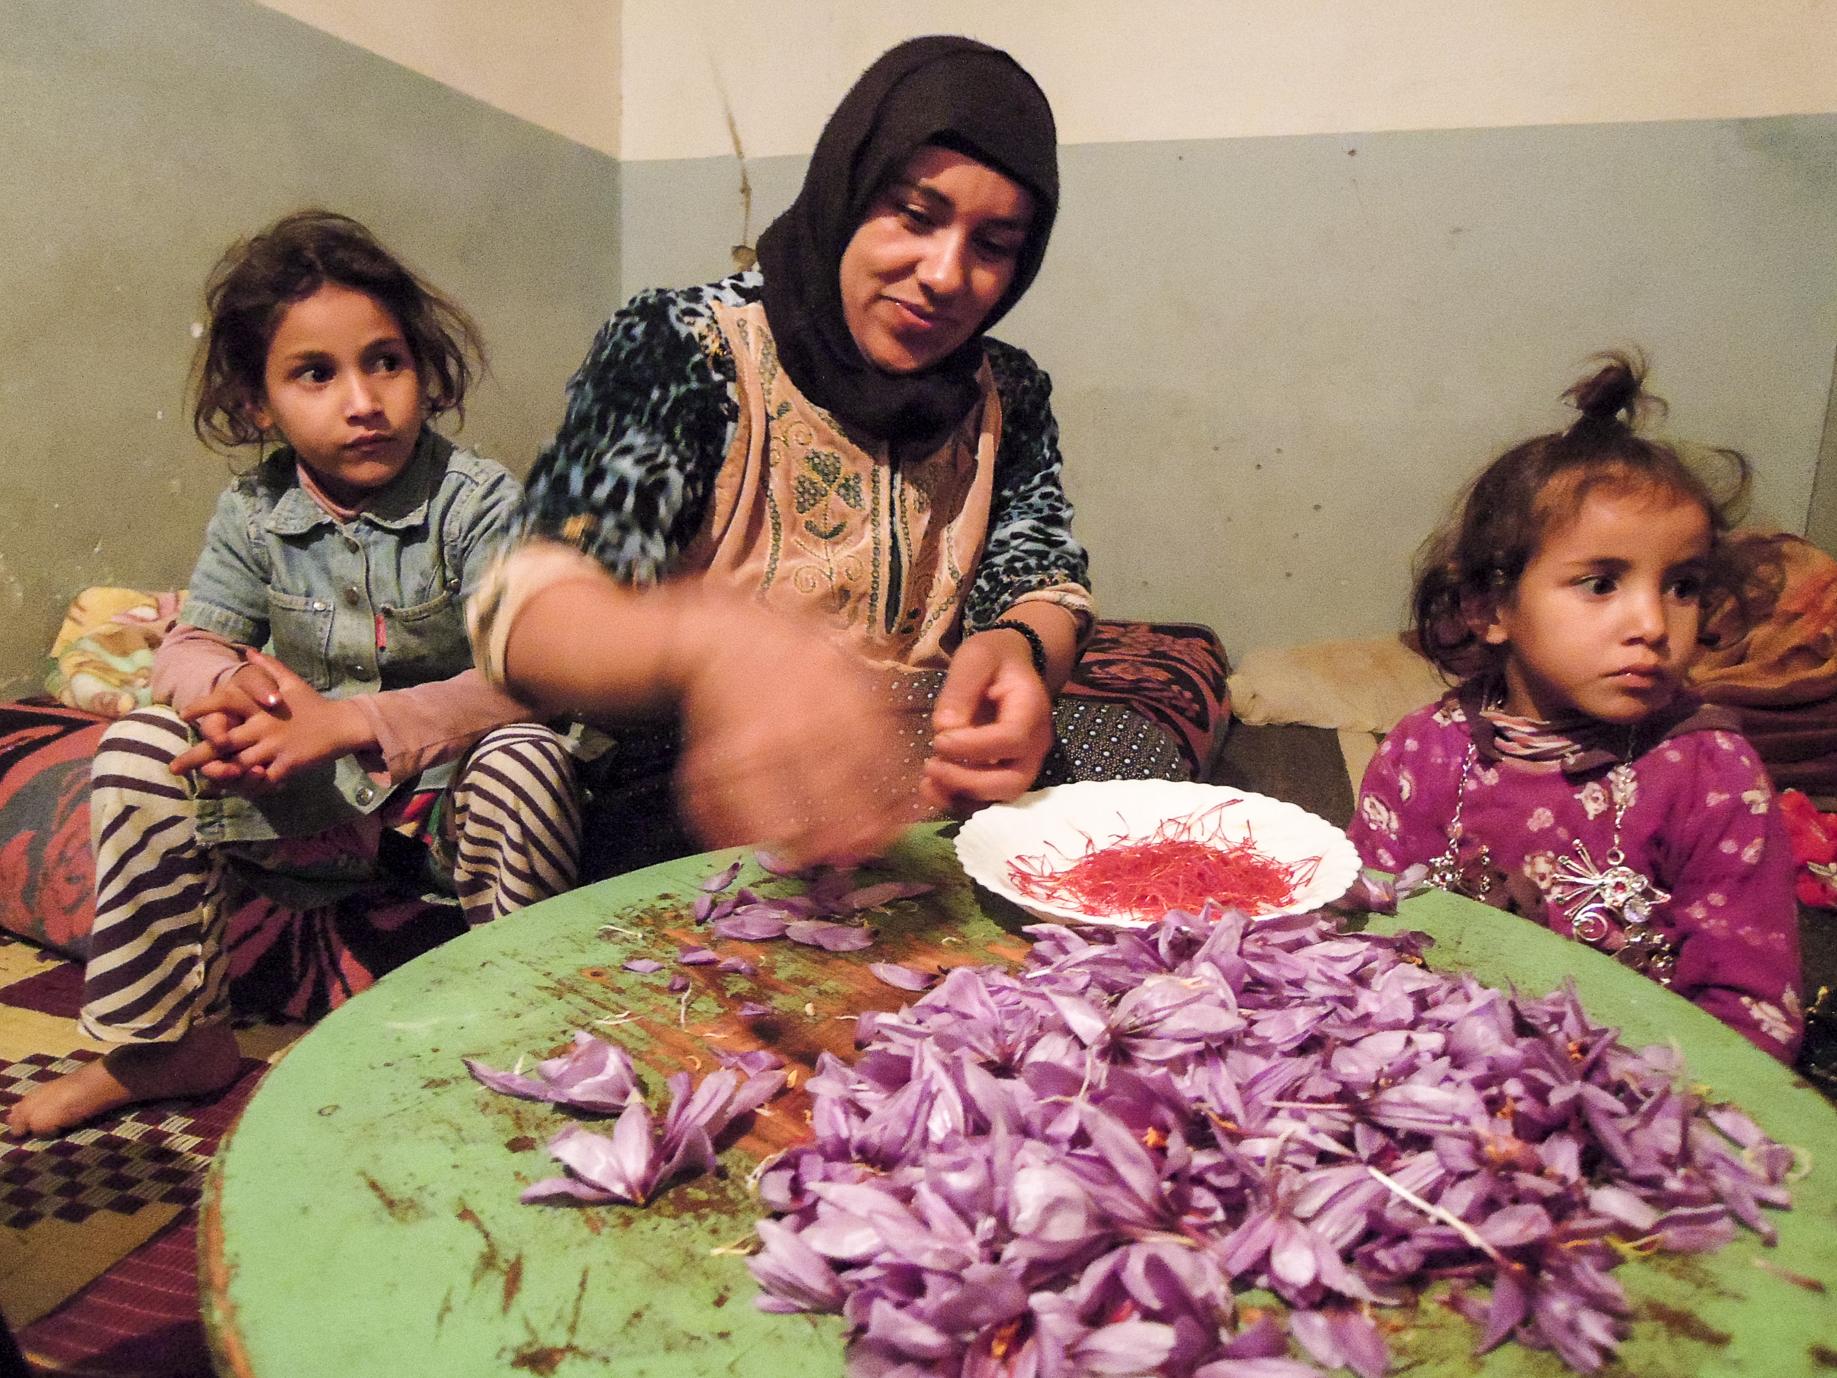 Marokko, Sabbatical, Berberin, Safran, organic17